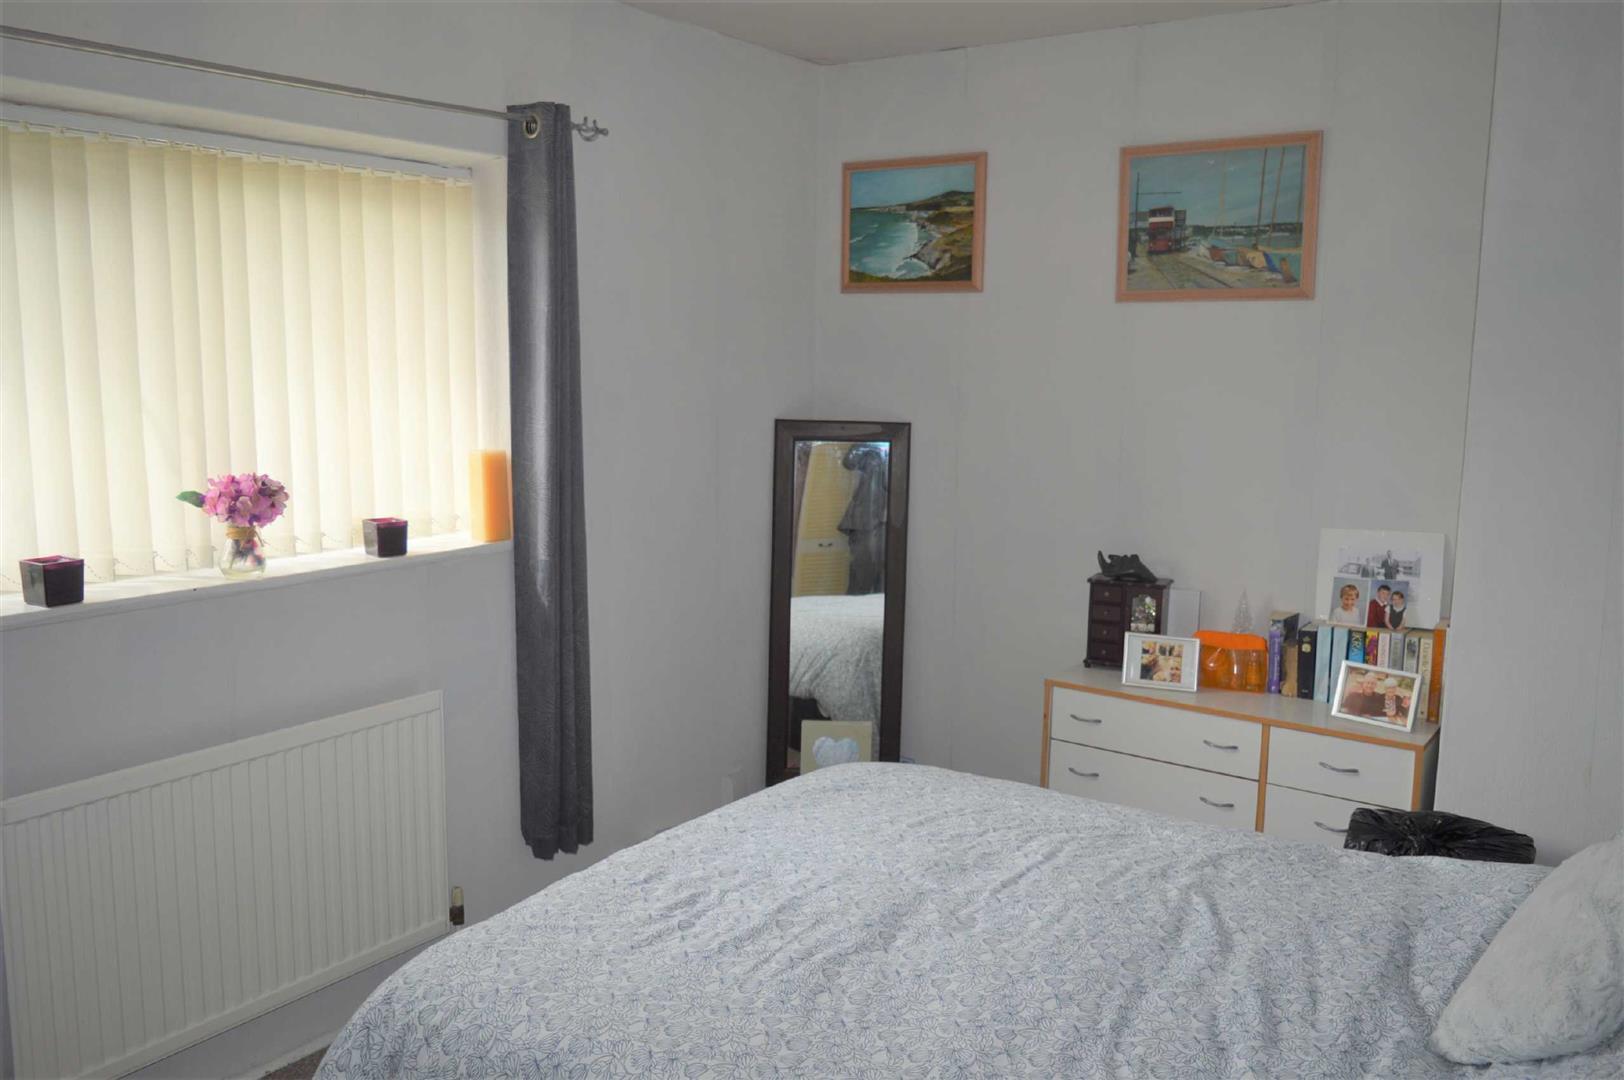 Emlyn Road, Mayhill, Swansea, SA1 6TJ